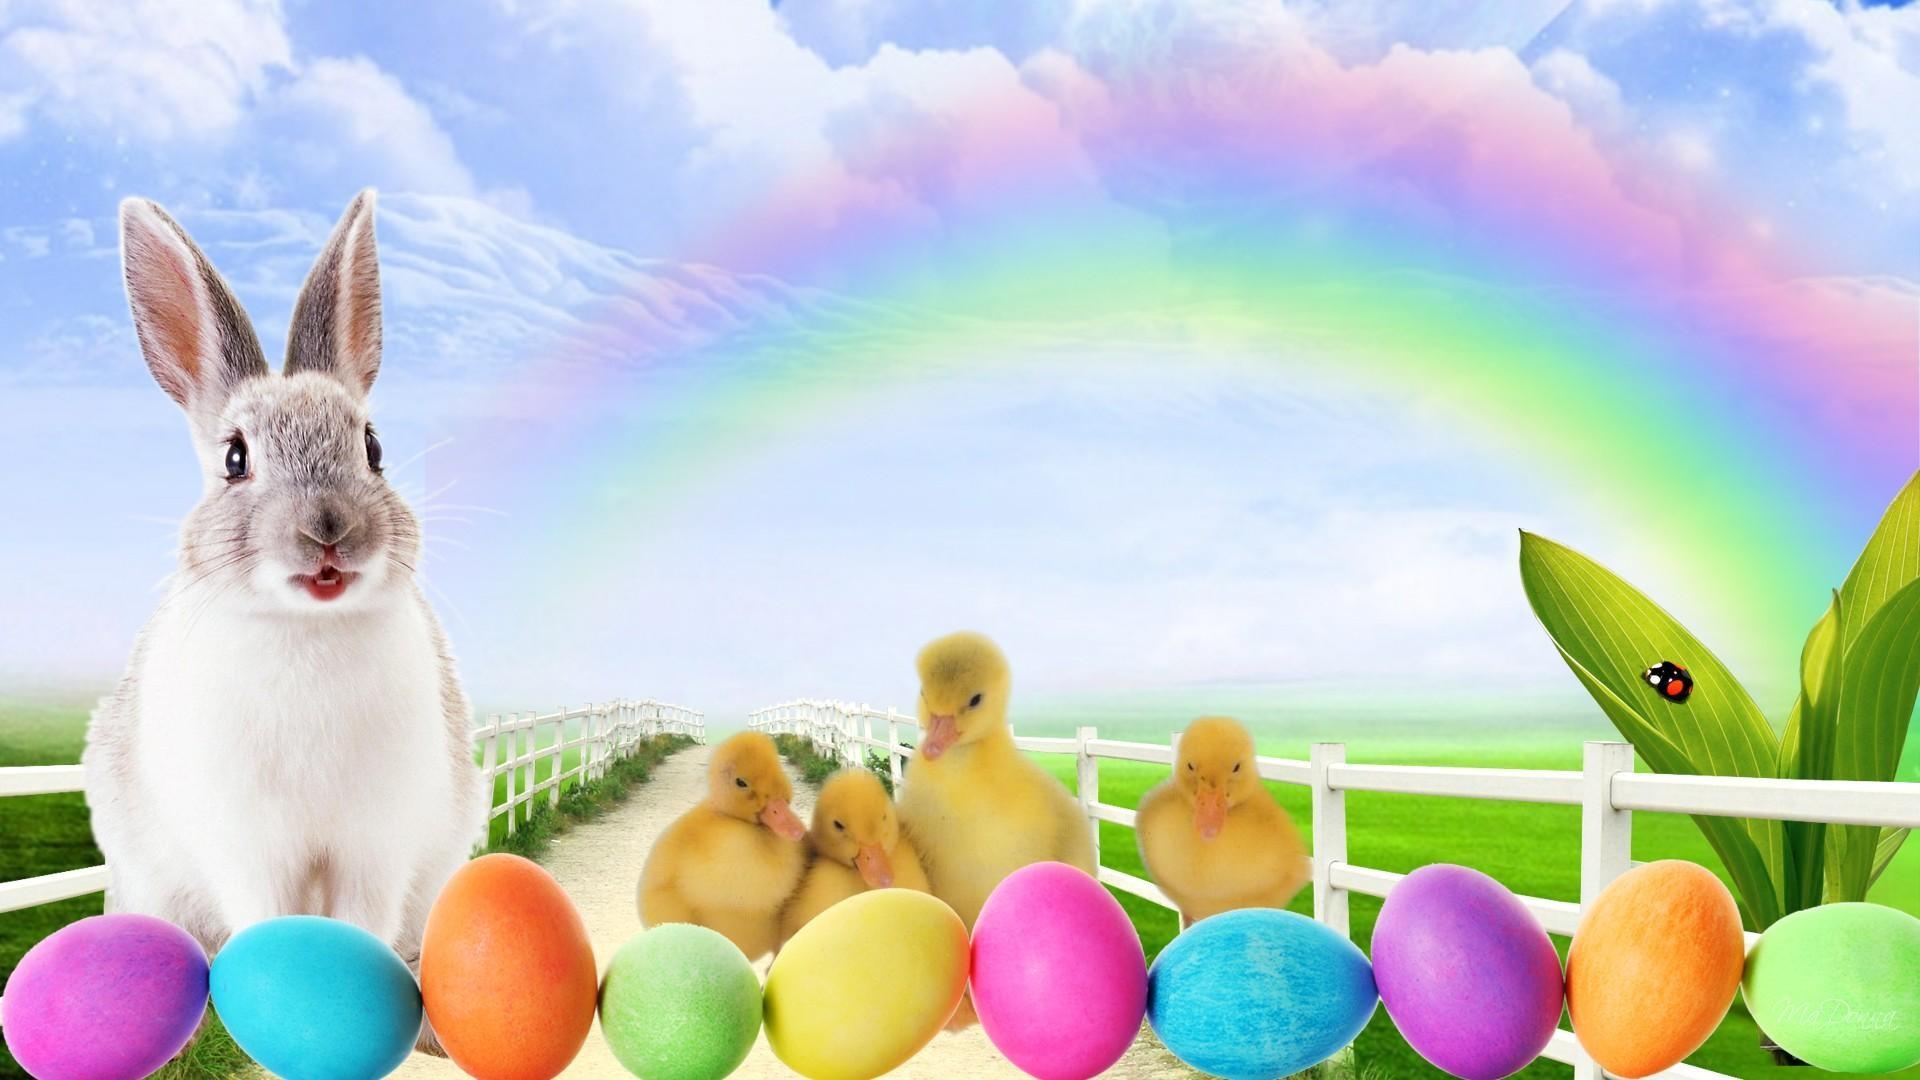 Easter Bunny Wallpaper (01)